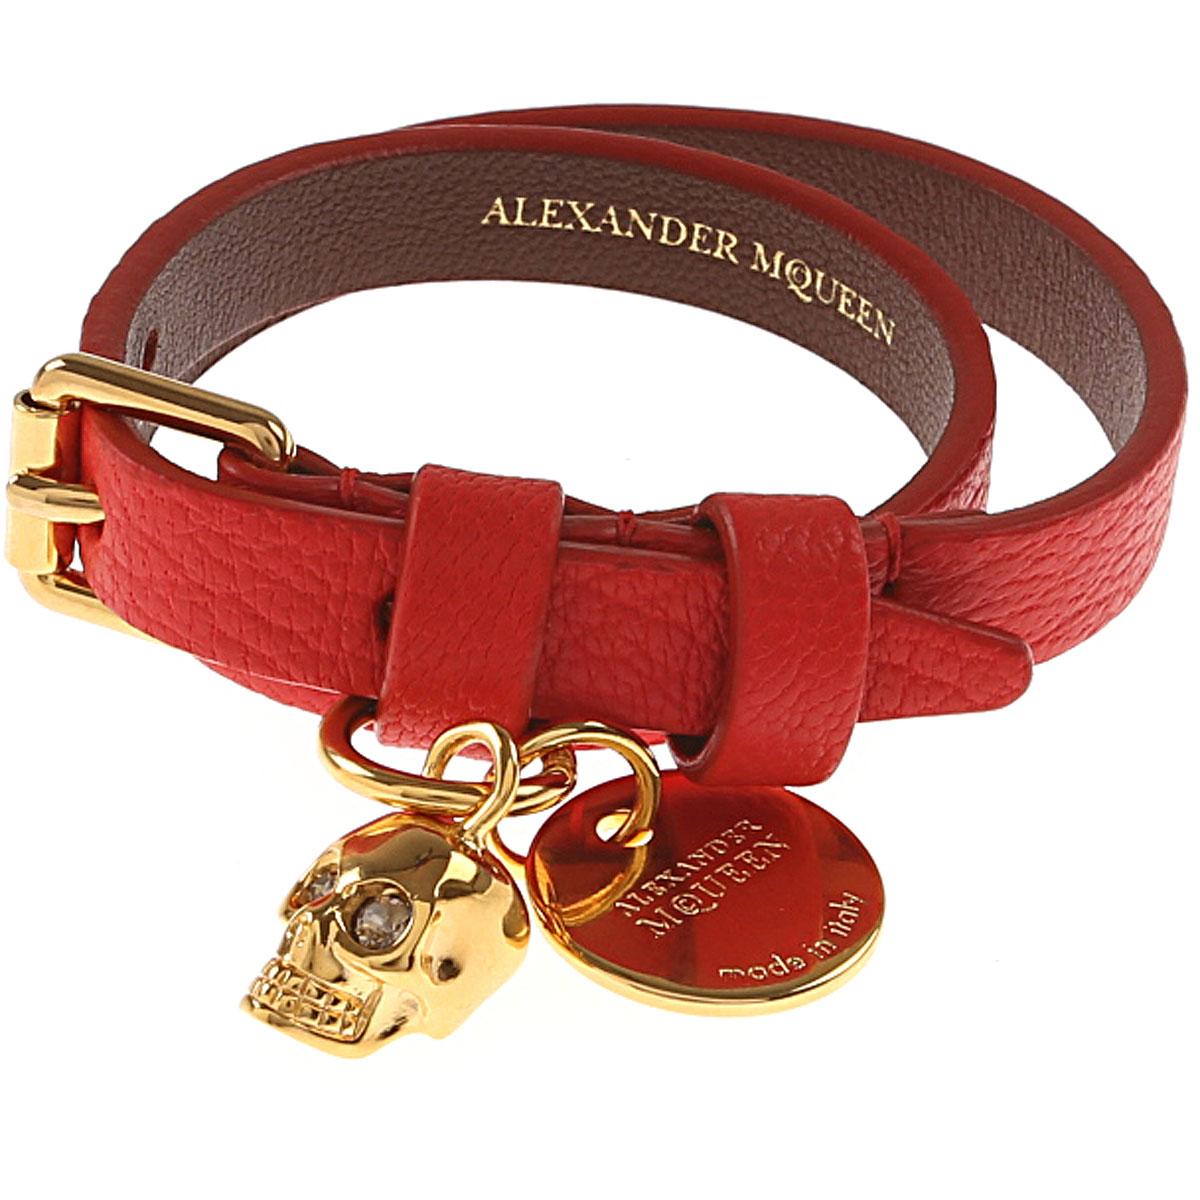 Image of Alexander McQueen Bracelet for Women, Red, leaher, 2017